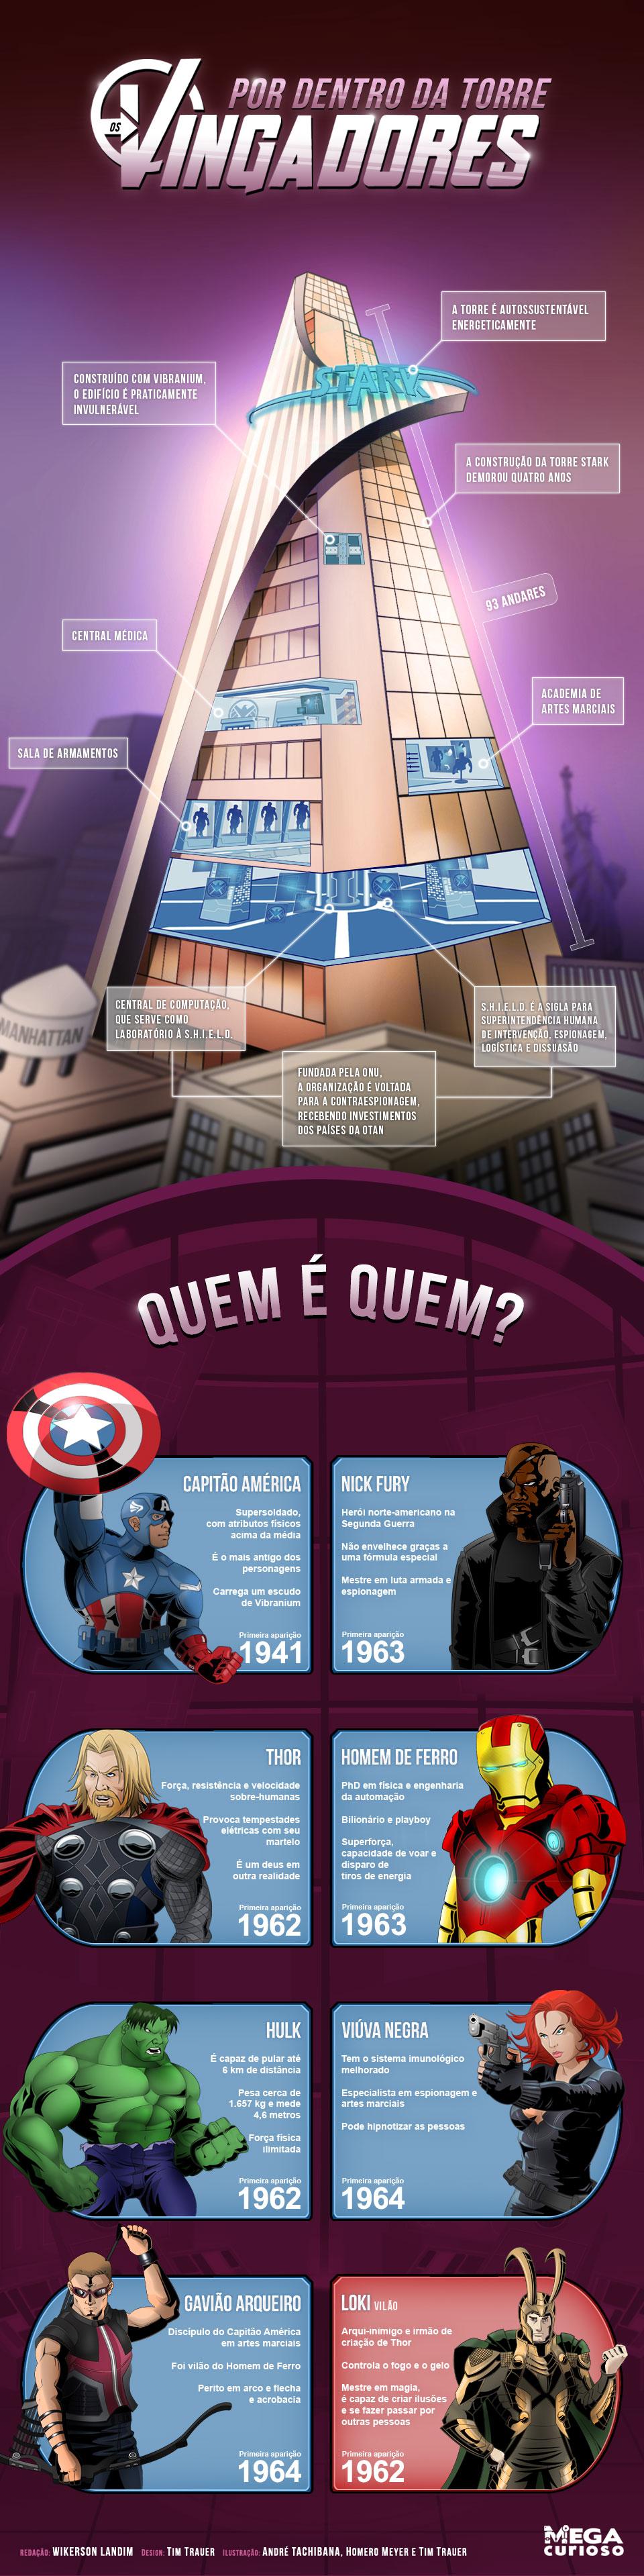 Infográfico - Por dentro da torre de Os Vingadores [infográfico]